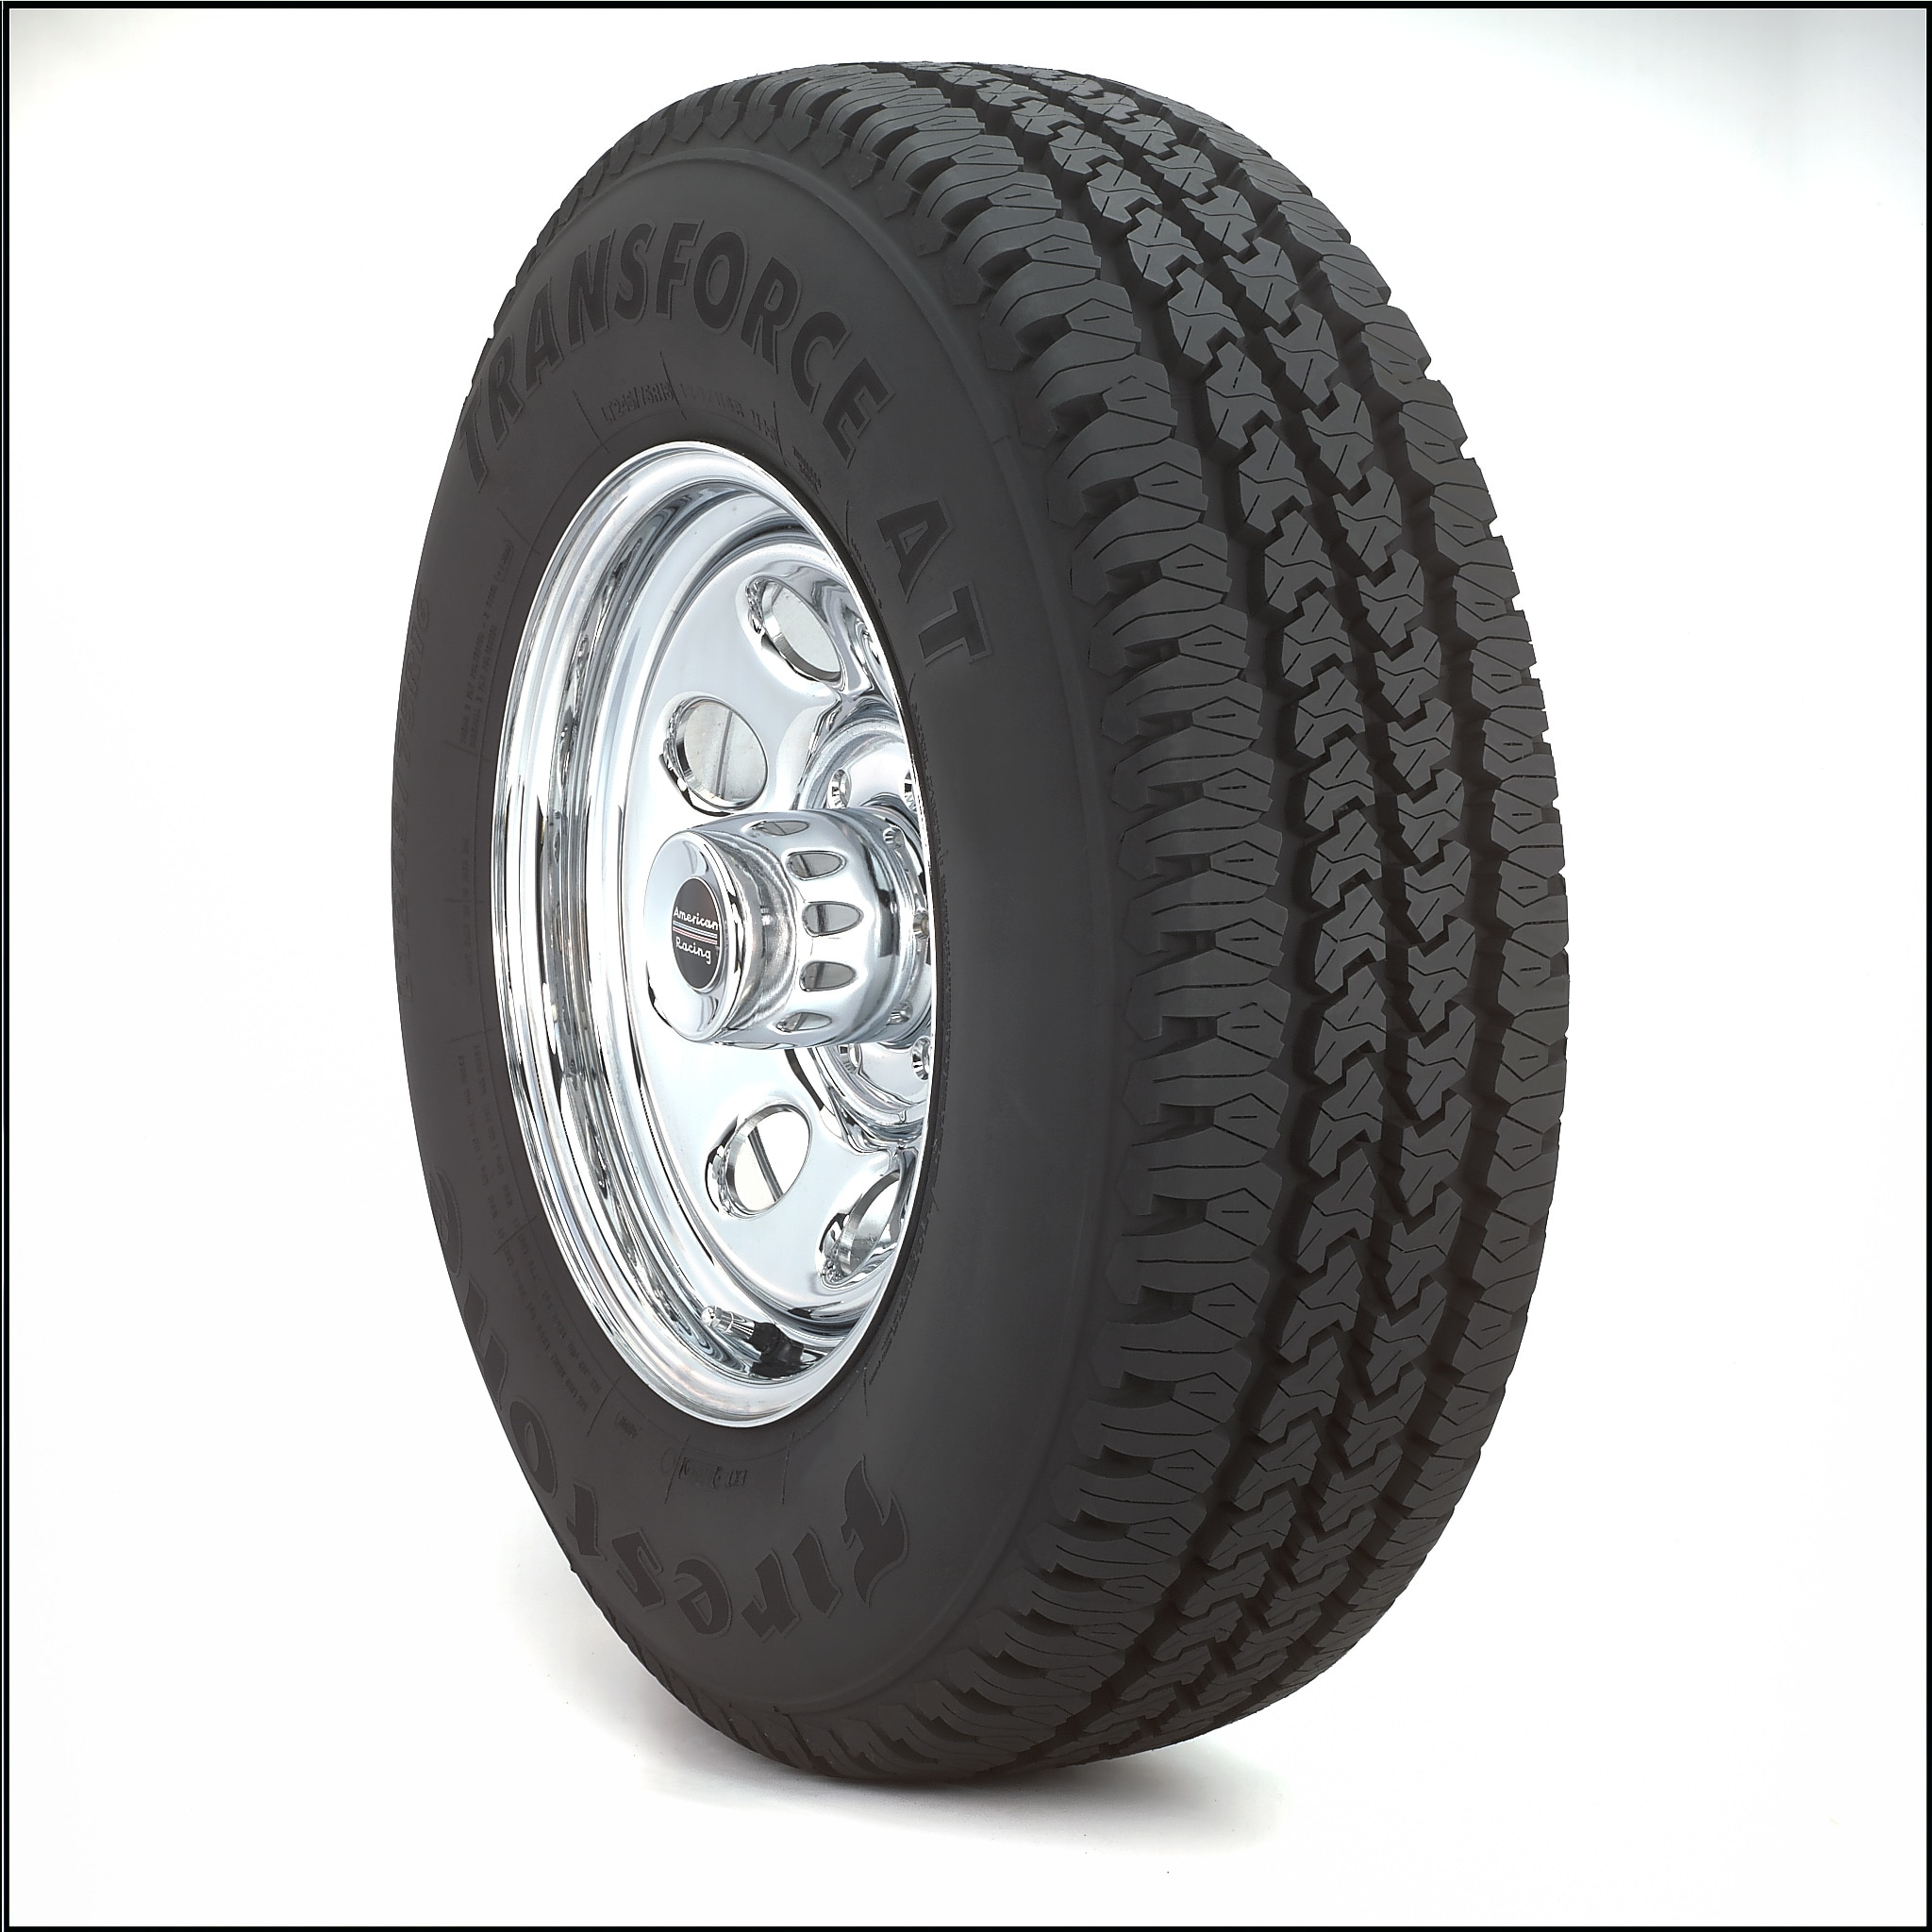 firestone tire logos corporate logos and photos firestone tires. Black Bedroom Furniture Sets. Home Design Ideas